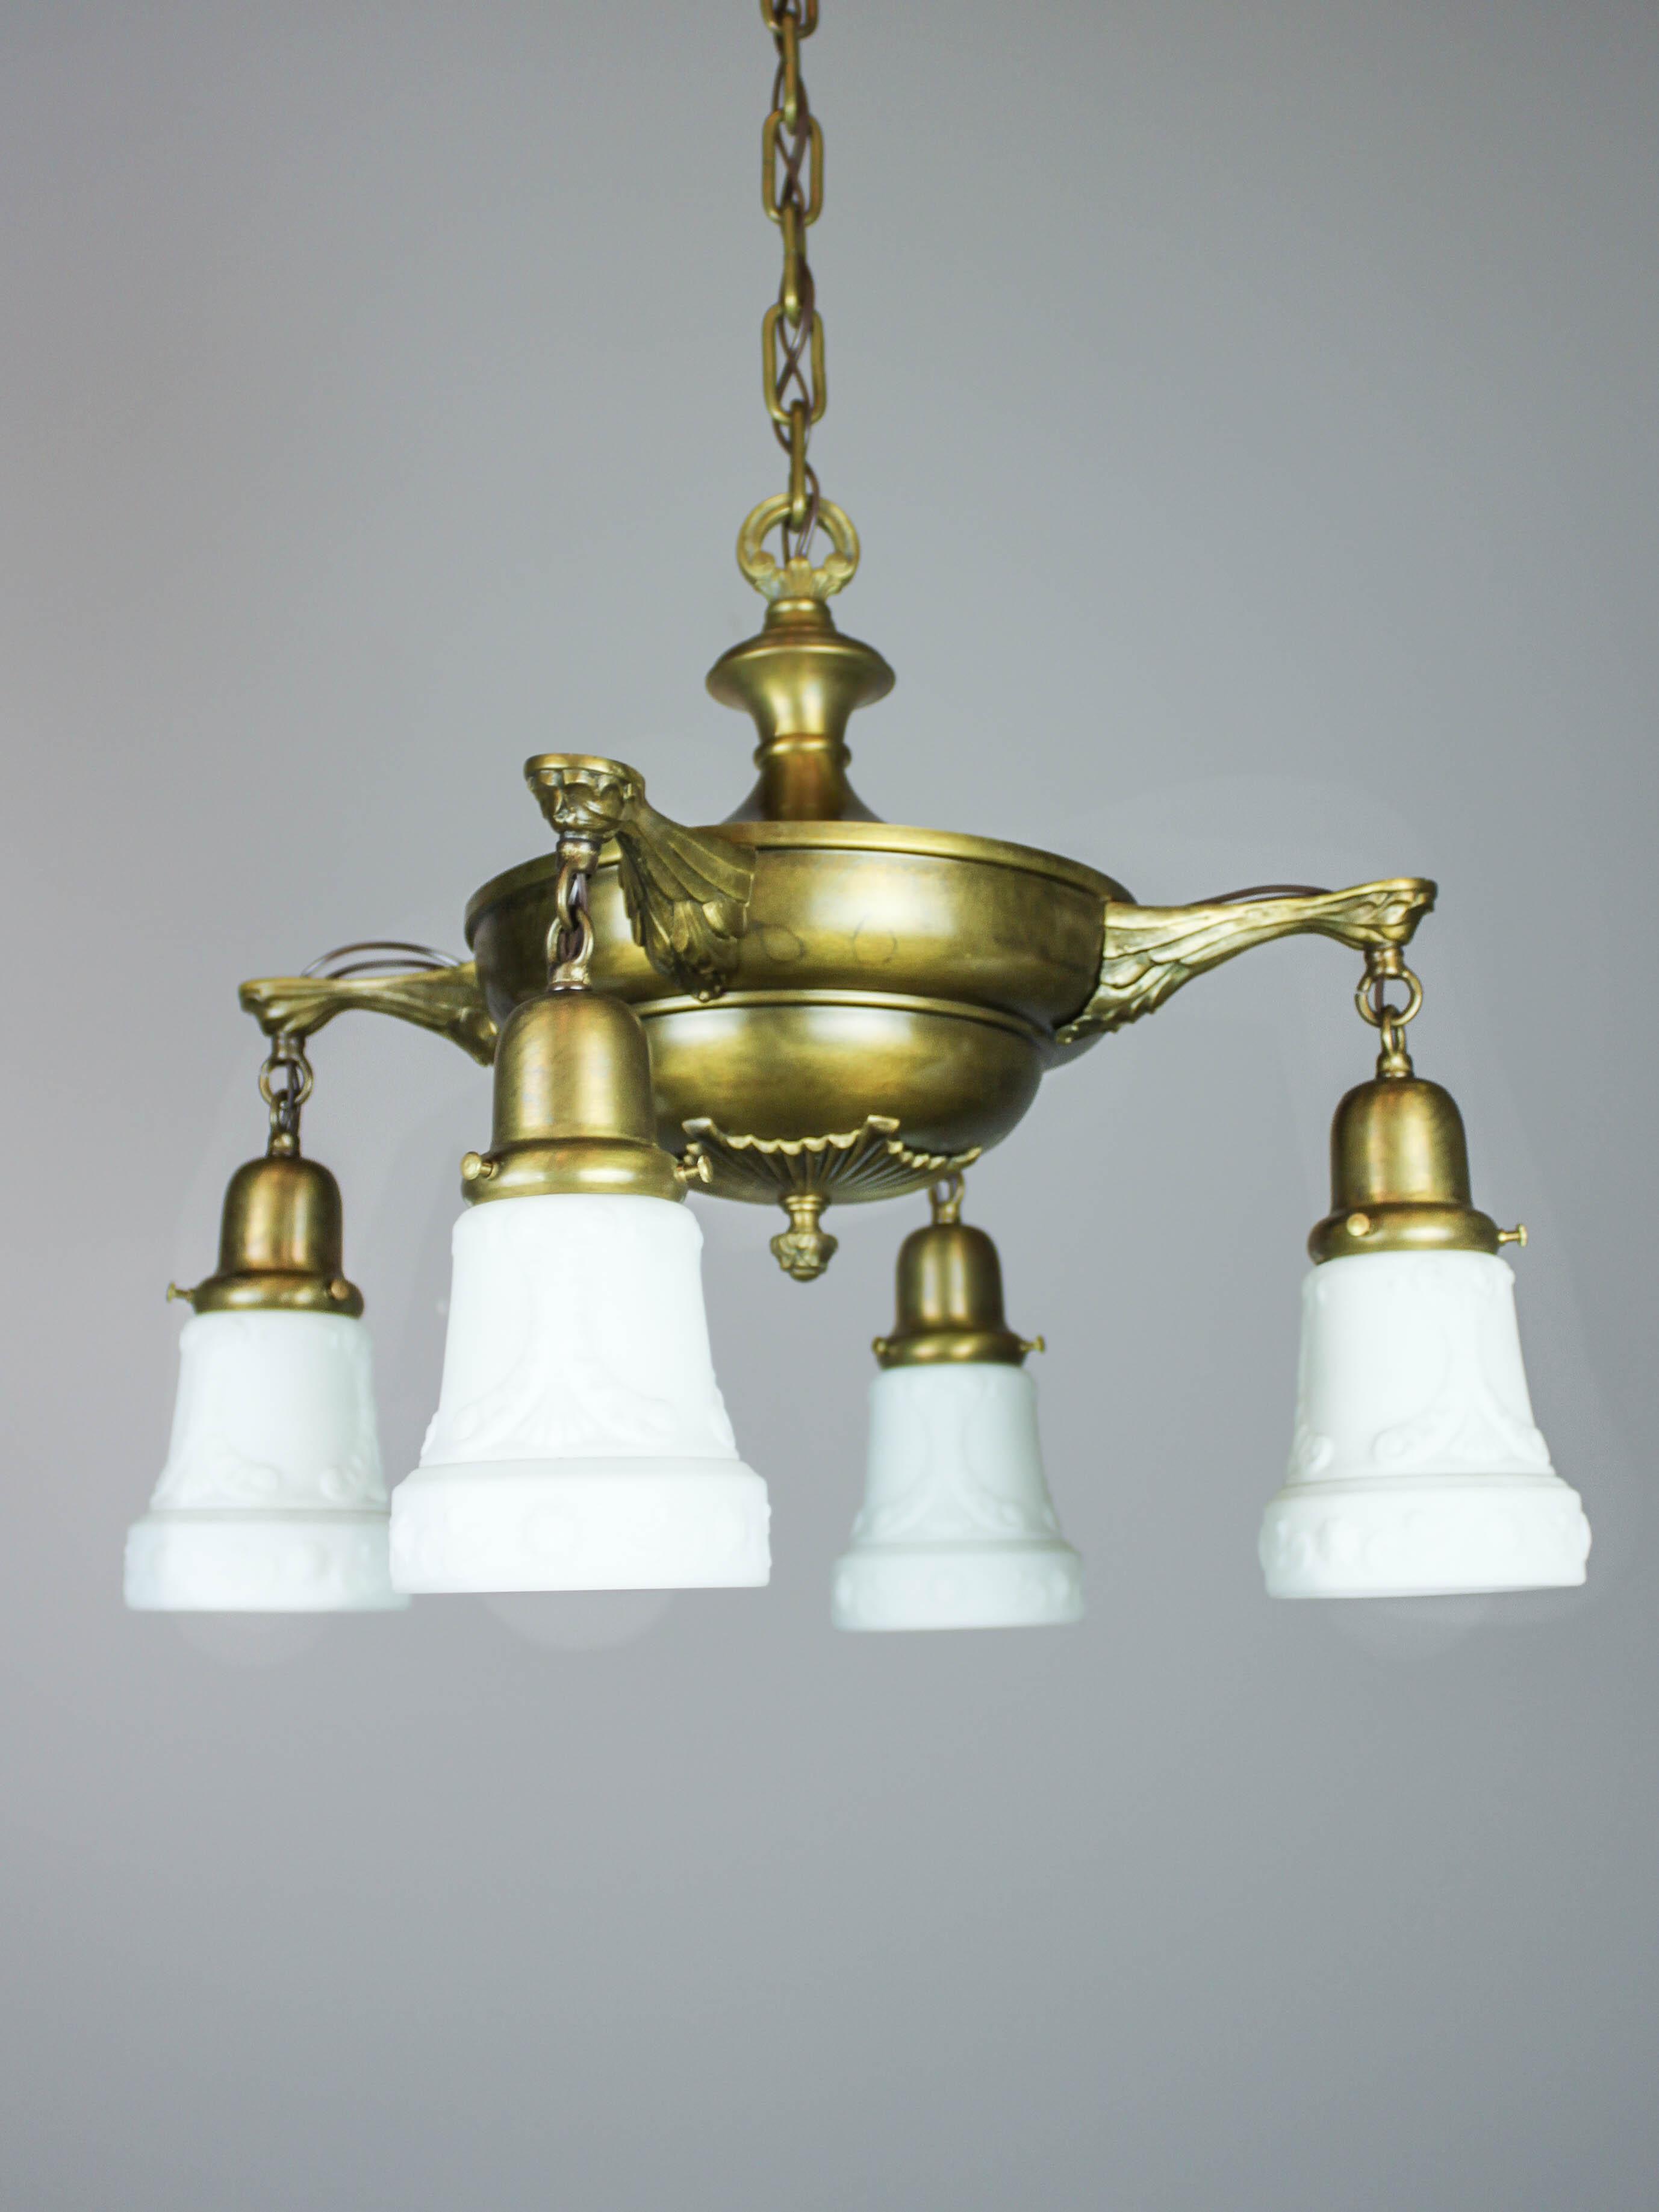 Original Pan Light Fixture 4 Light Renew Gallery